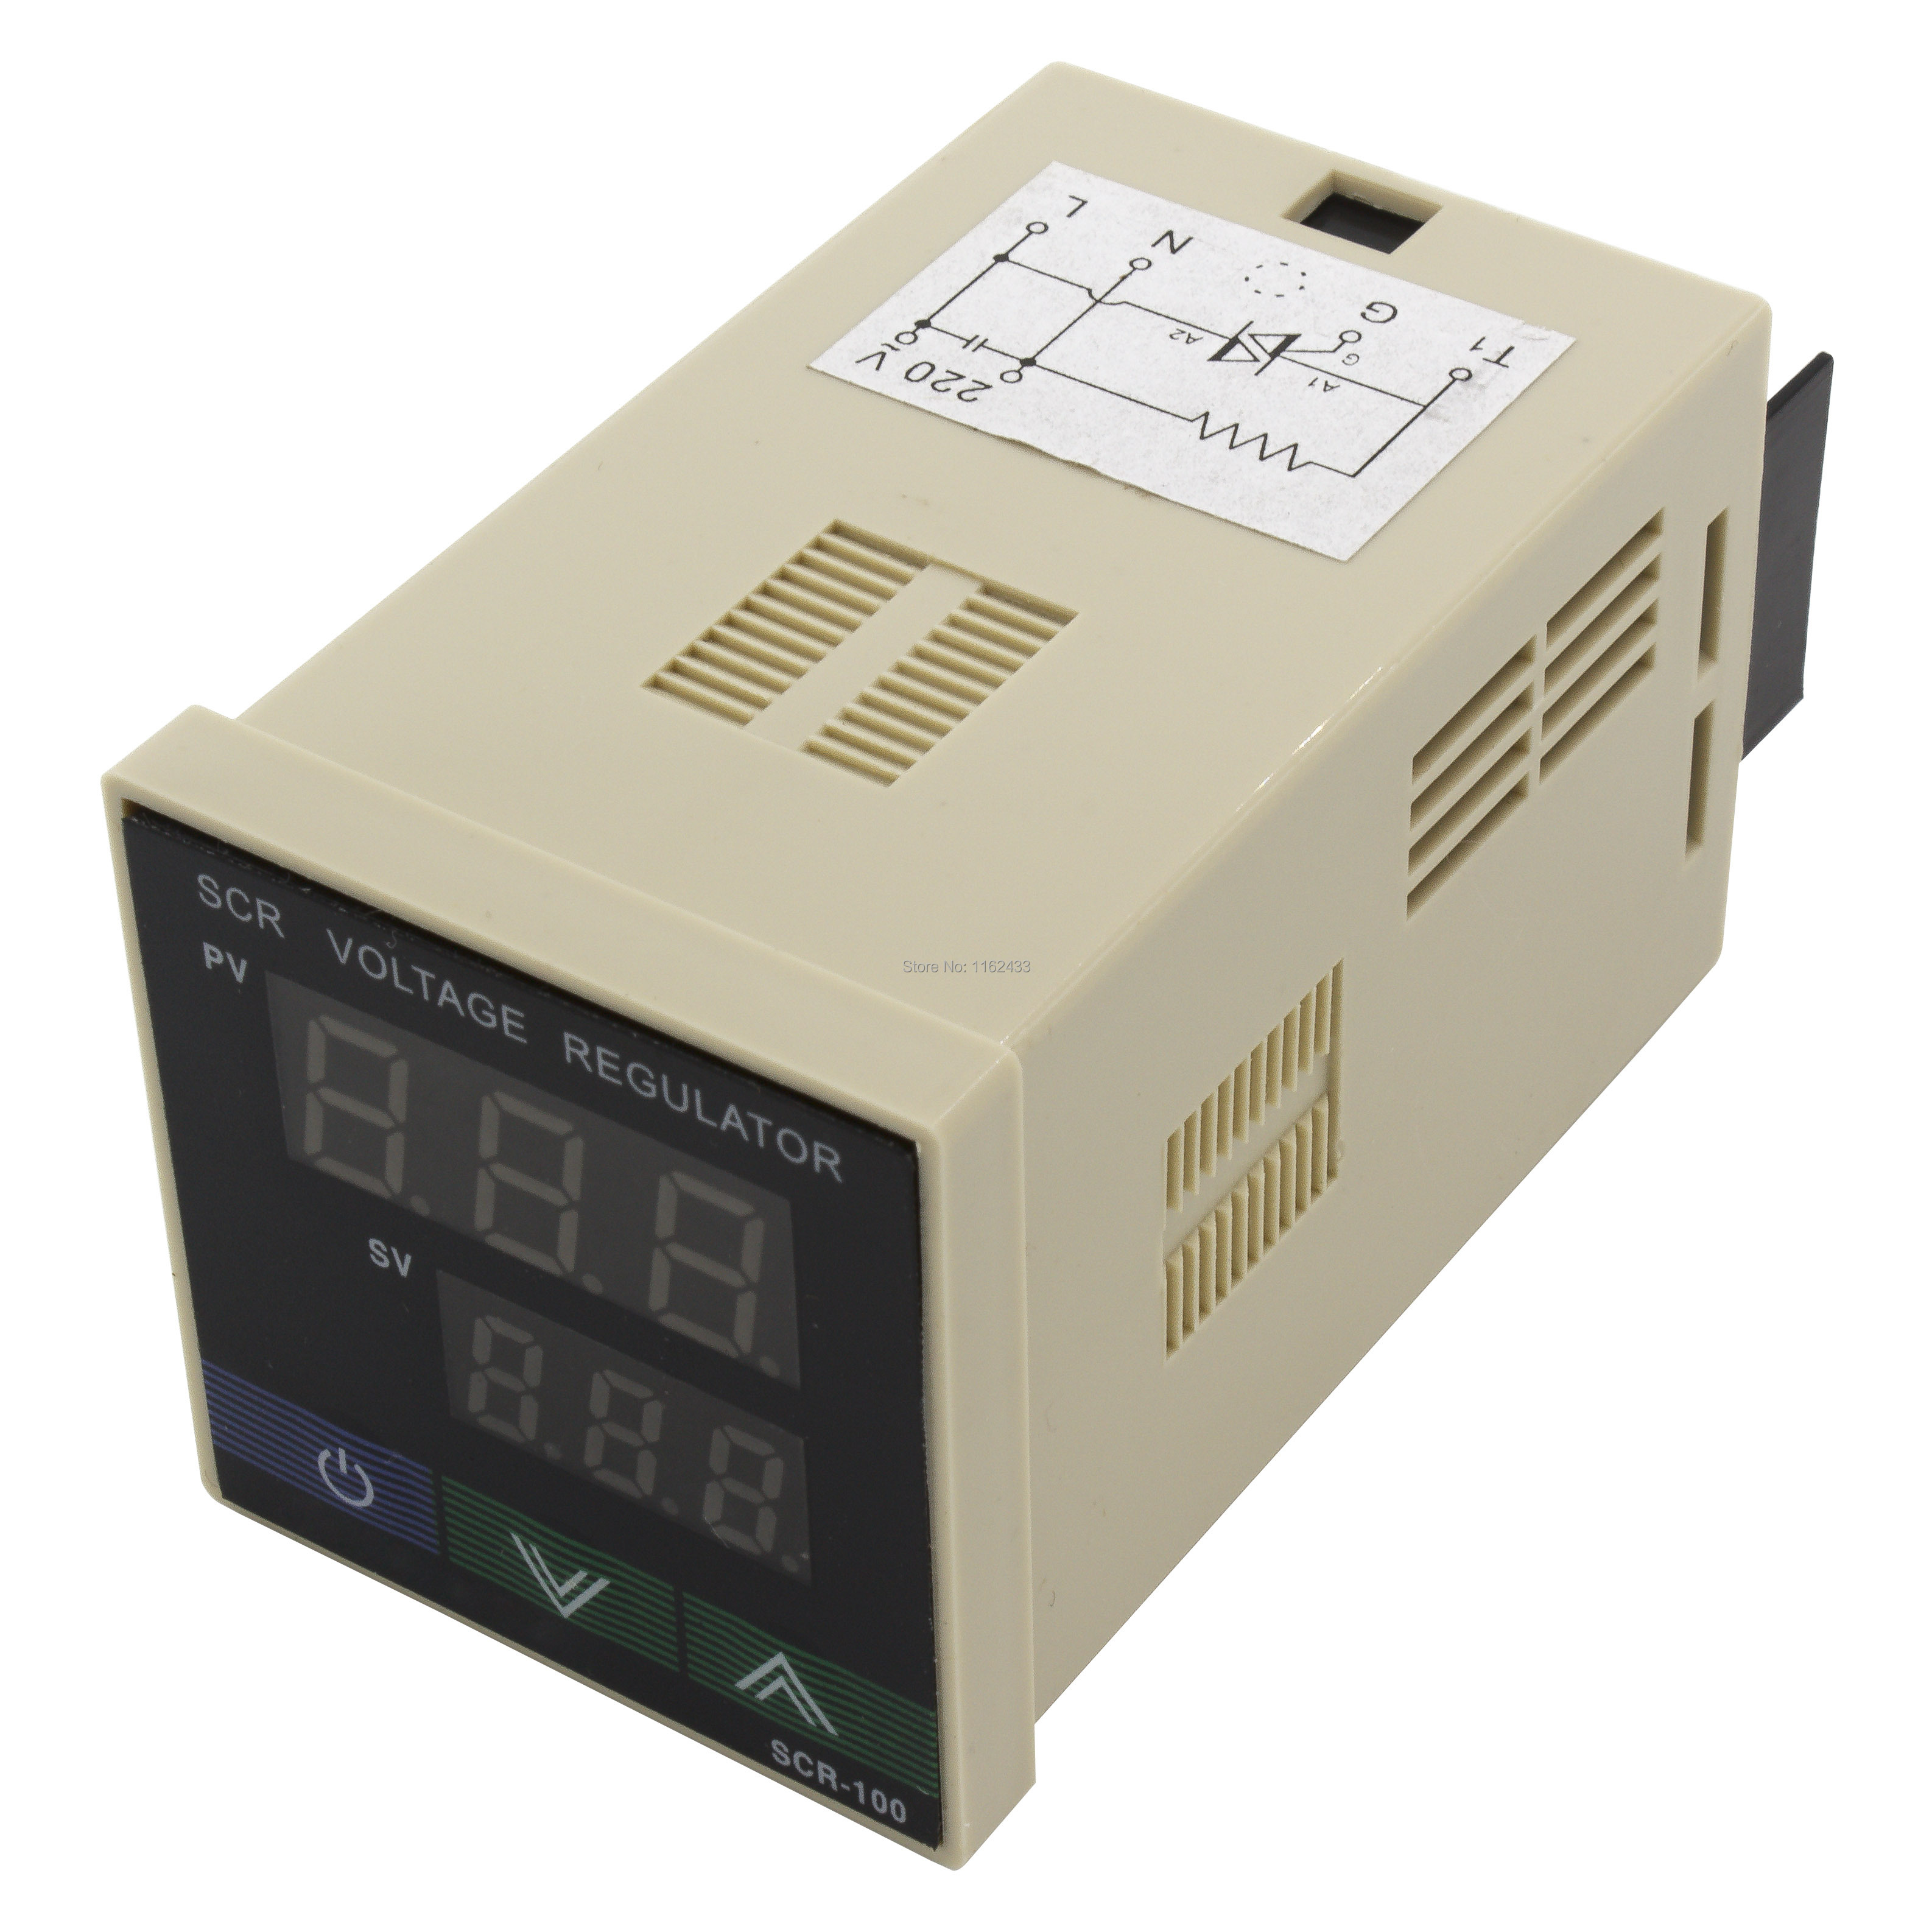 scr 100 regulátor napětí - SCR-100 digital SCR voltage regulator special for blow molding machine